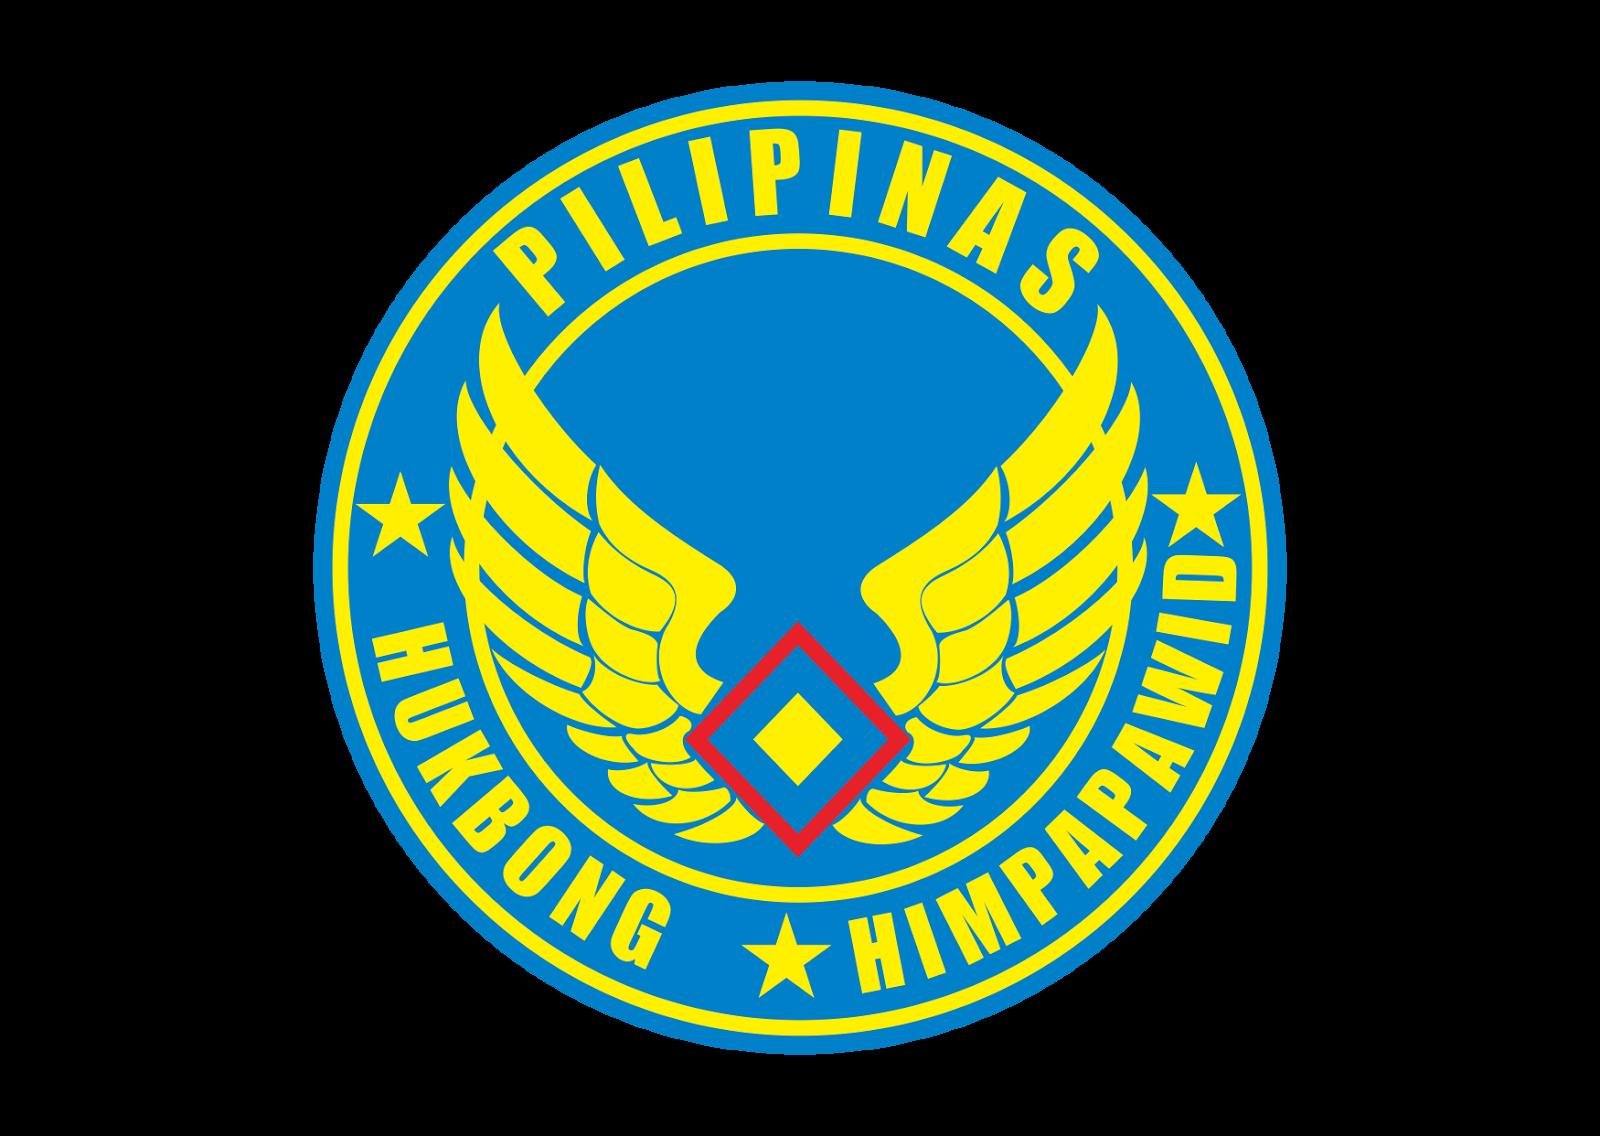 philippine air force logo vector format cdr ai eps svg pdf png rh master logo blogspot com air force logo vector file nike air force logo vector